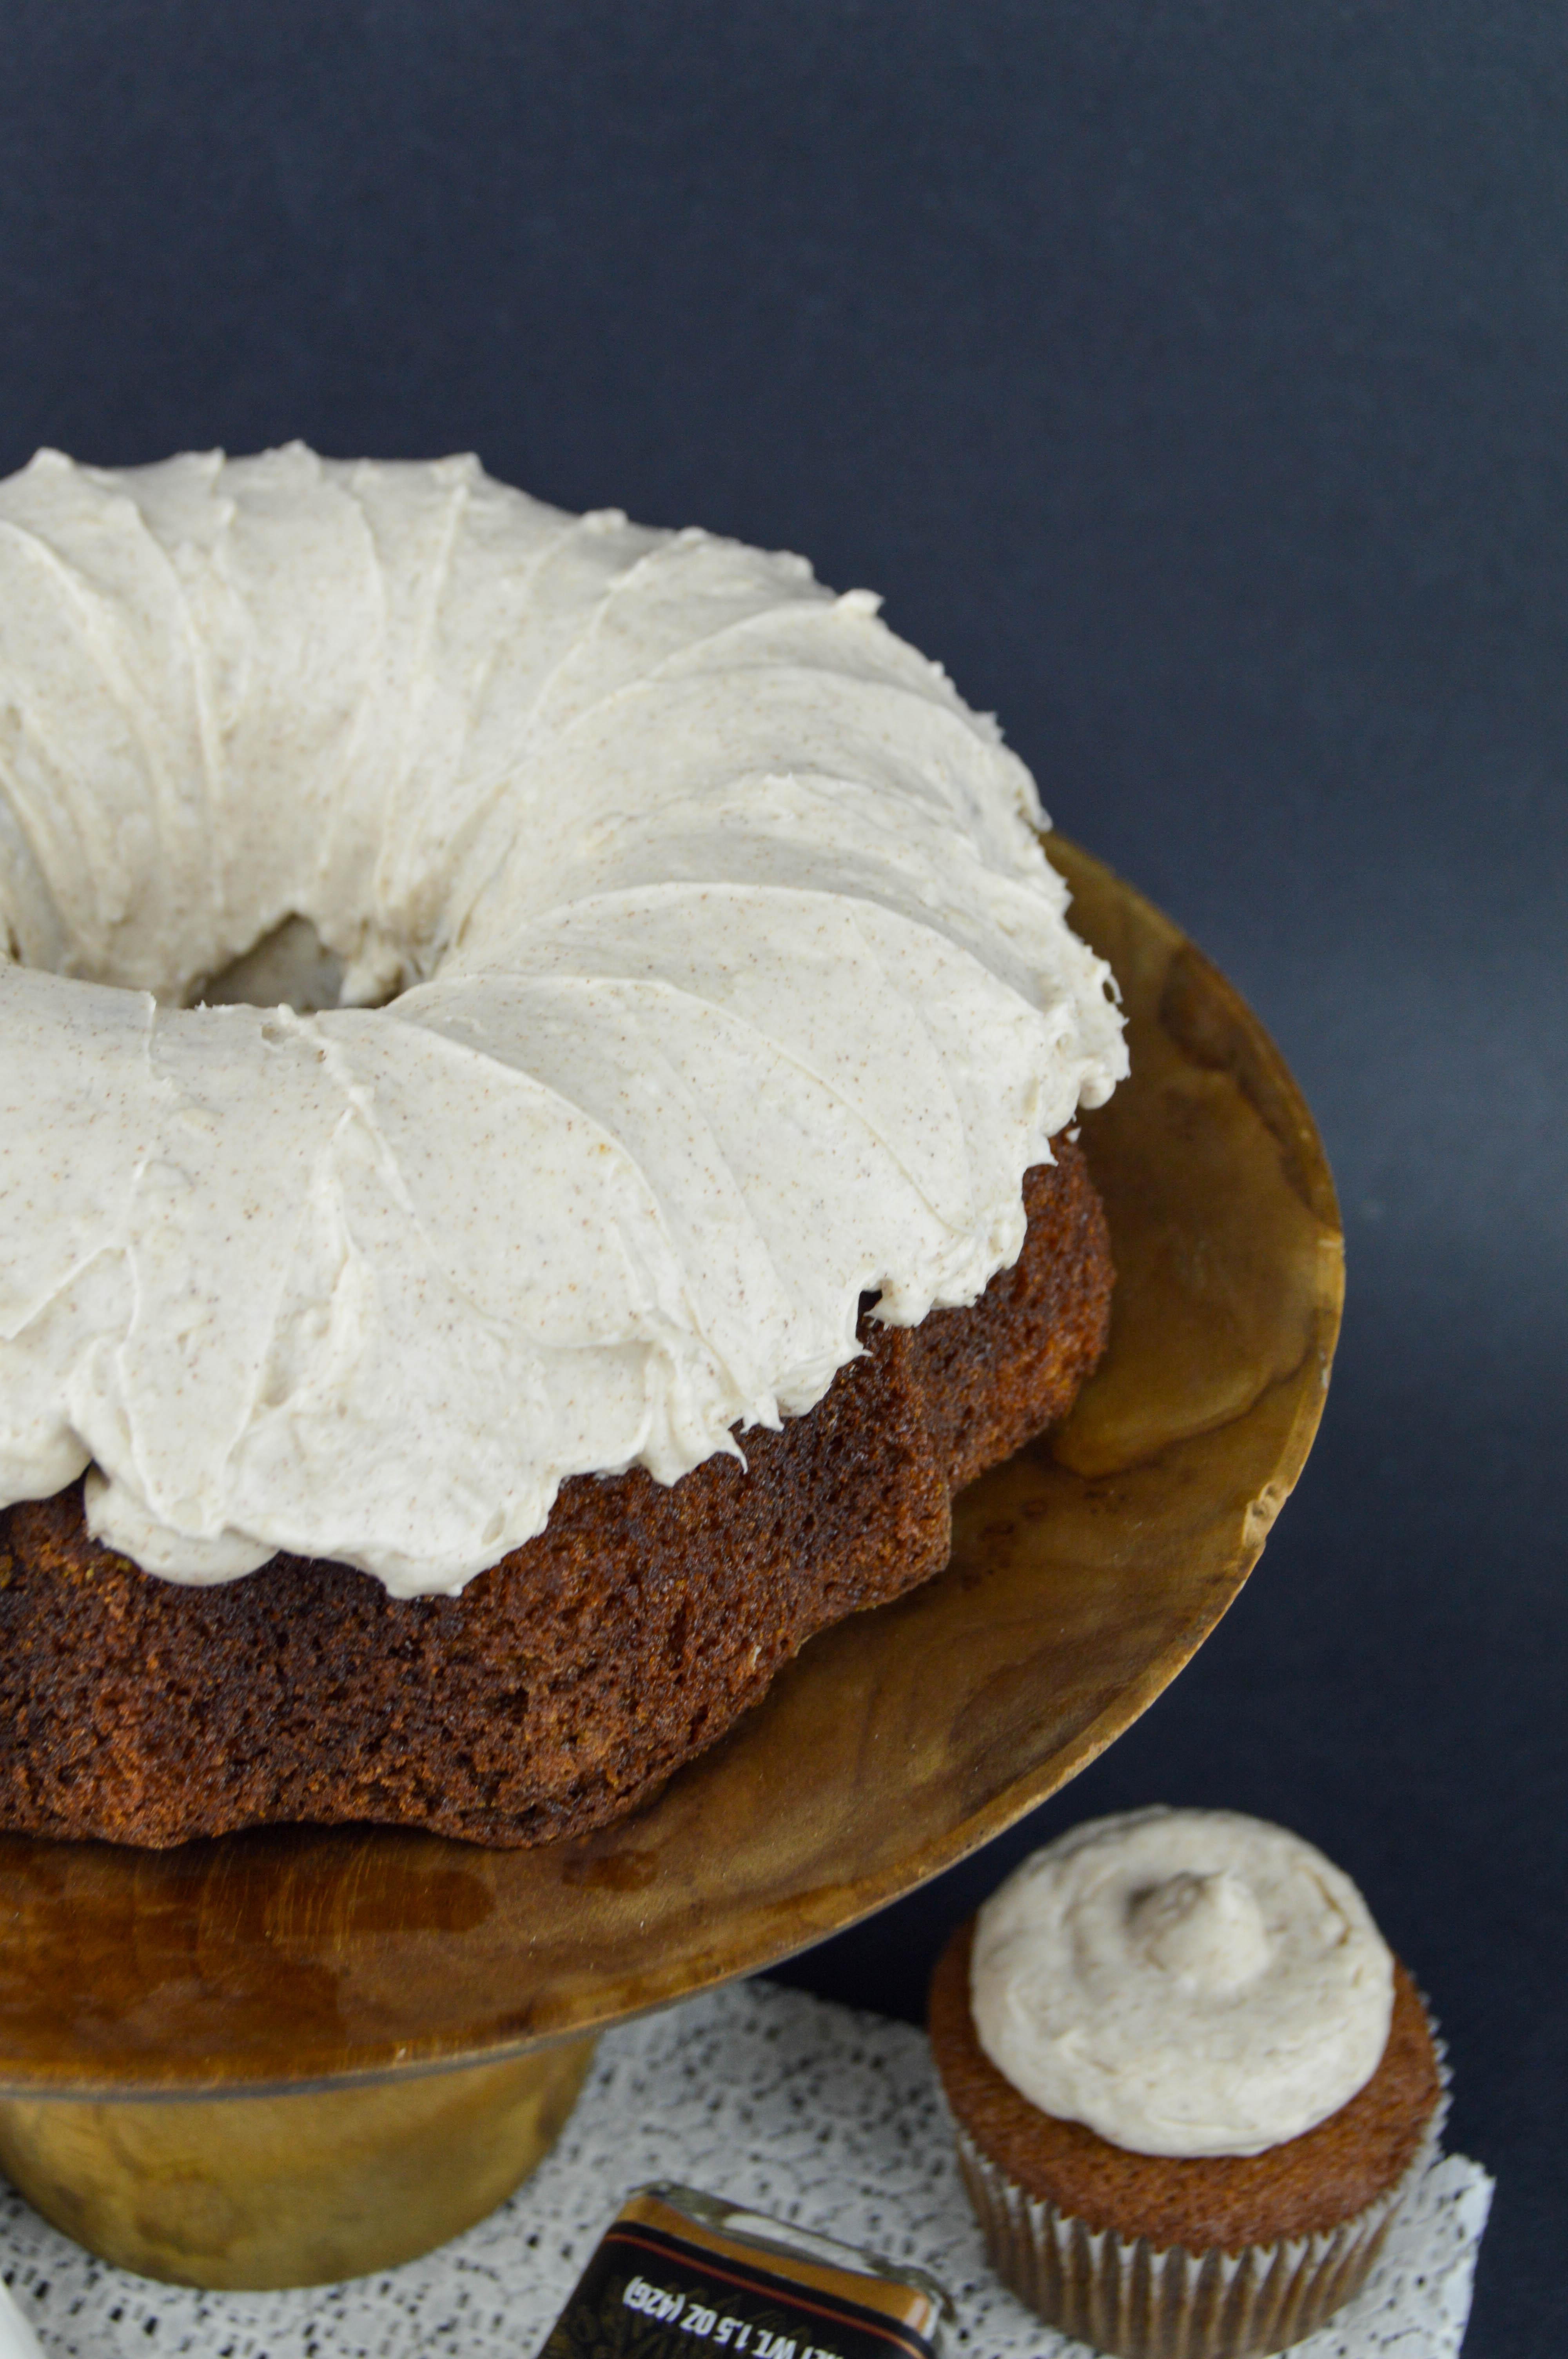 Gingerbread Bundt Cake Recipe With Cinnamon Cream Cheese